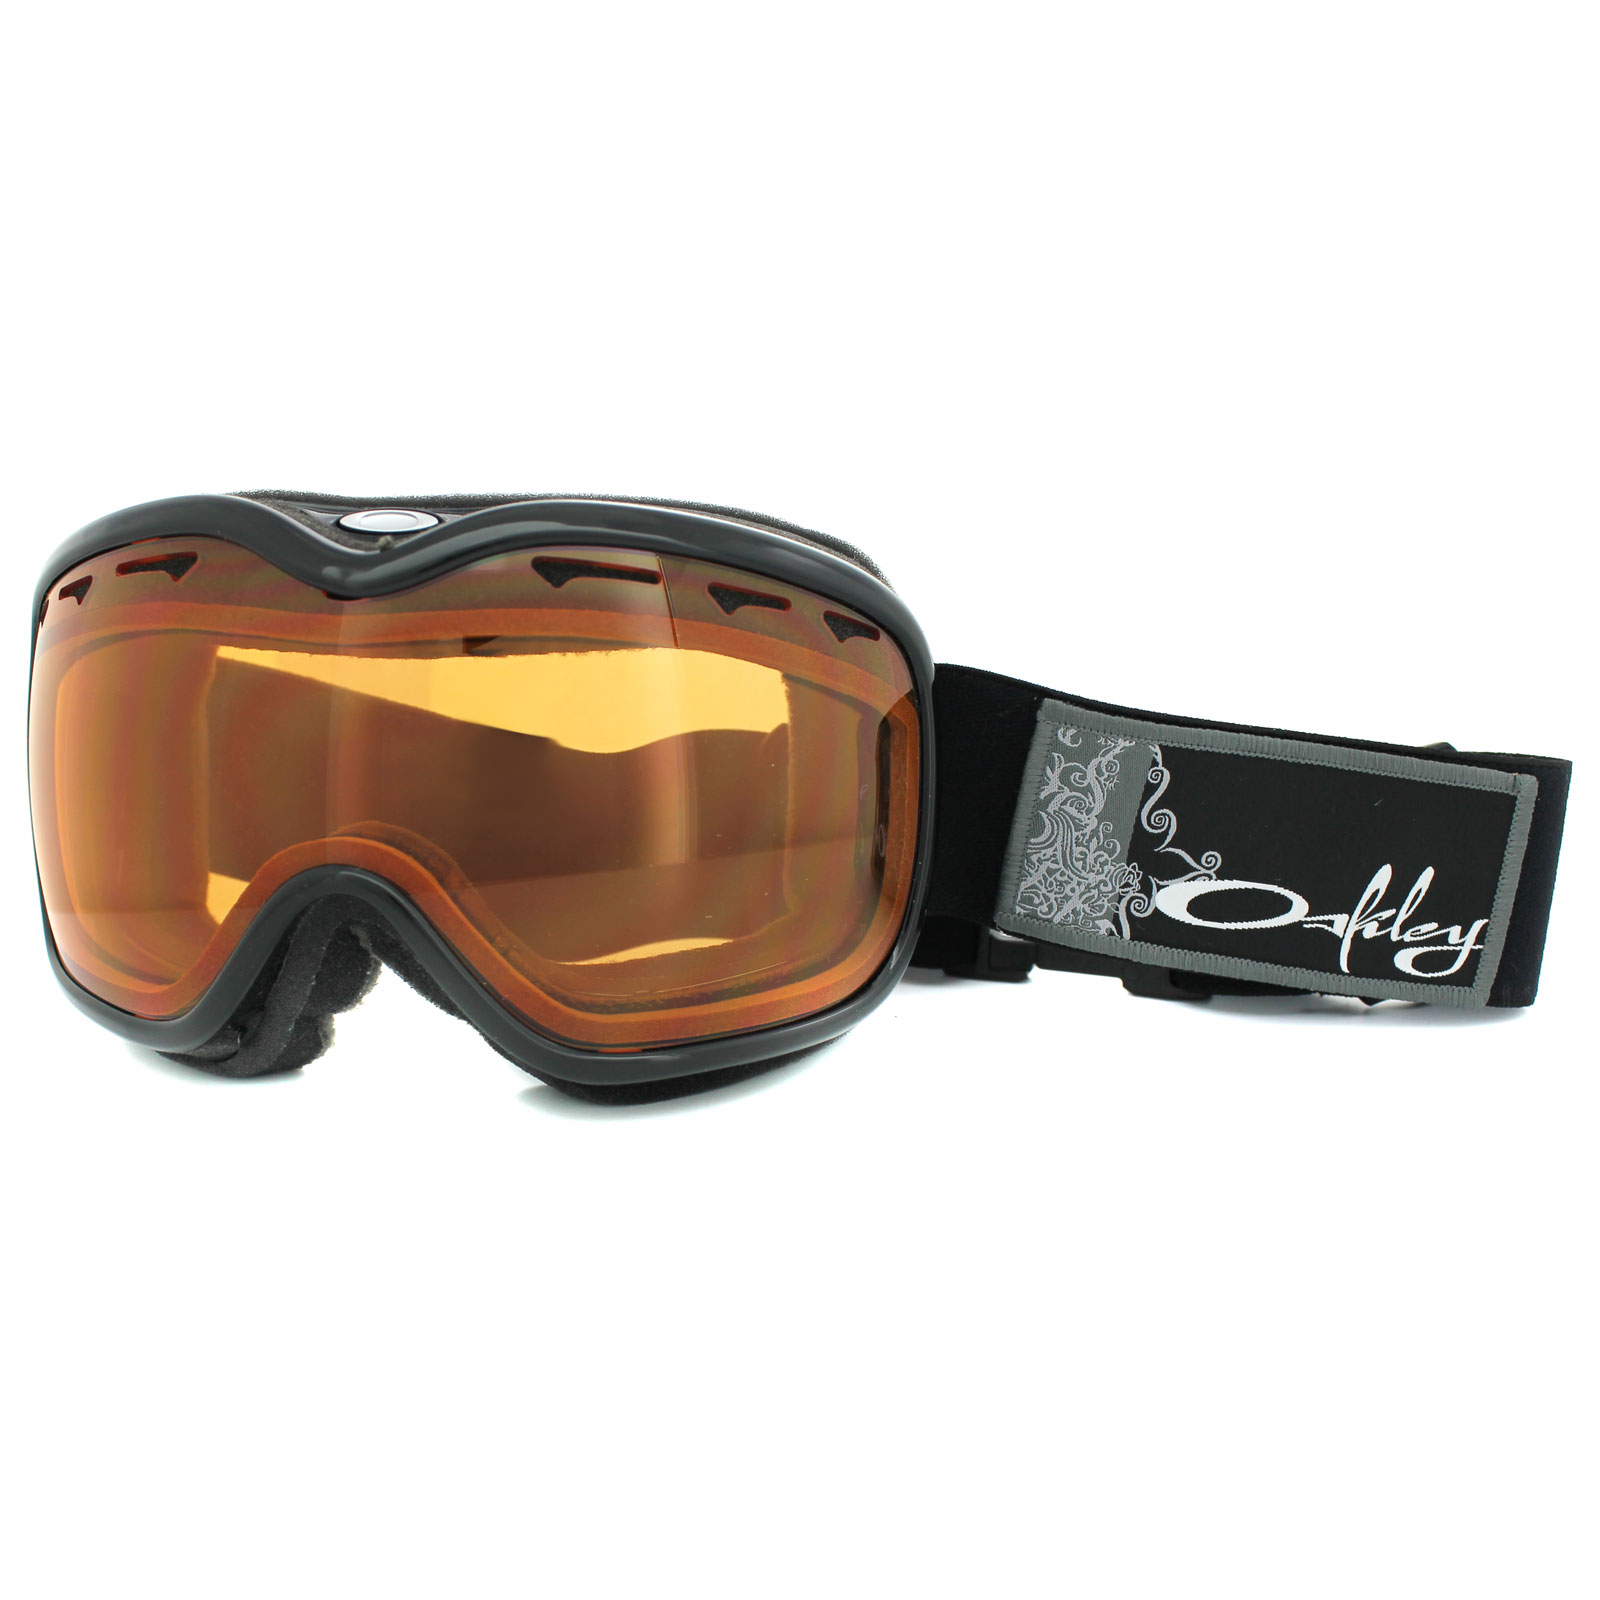 b8c566b8c2 Oakley Snow Goggles Stockholm Jet Black Persimmon 02-966 Thumbnail 1 ...